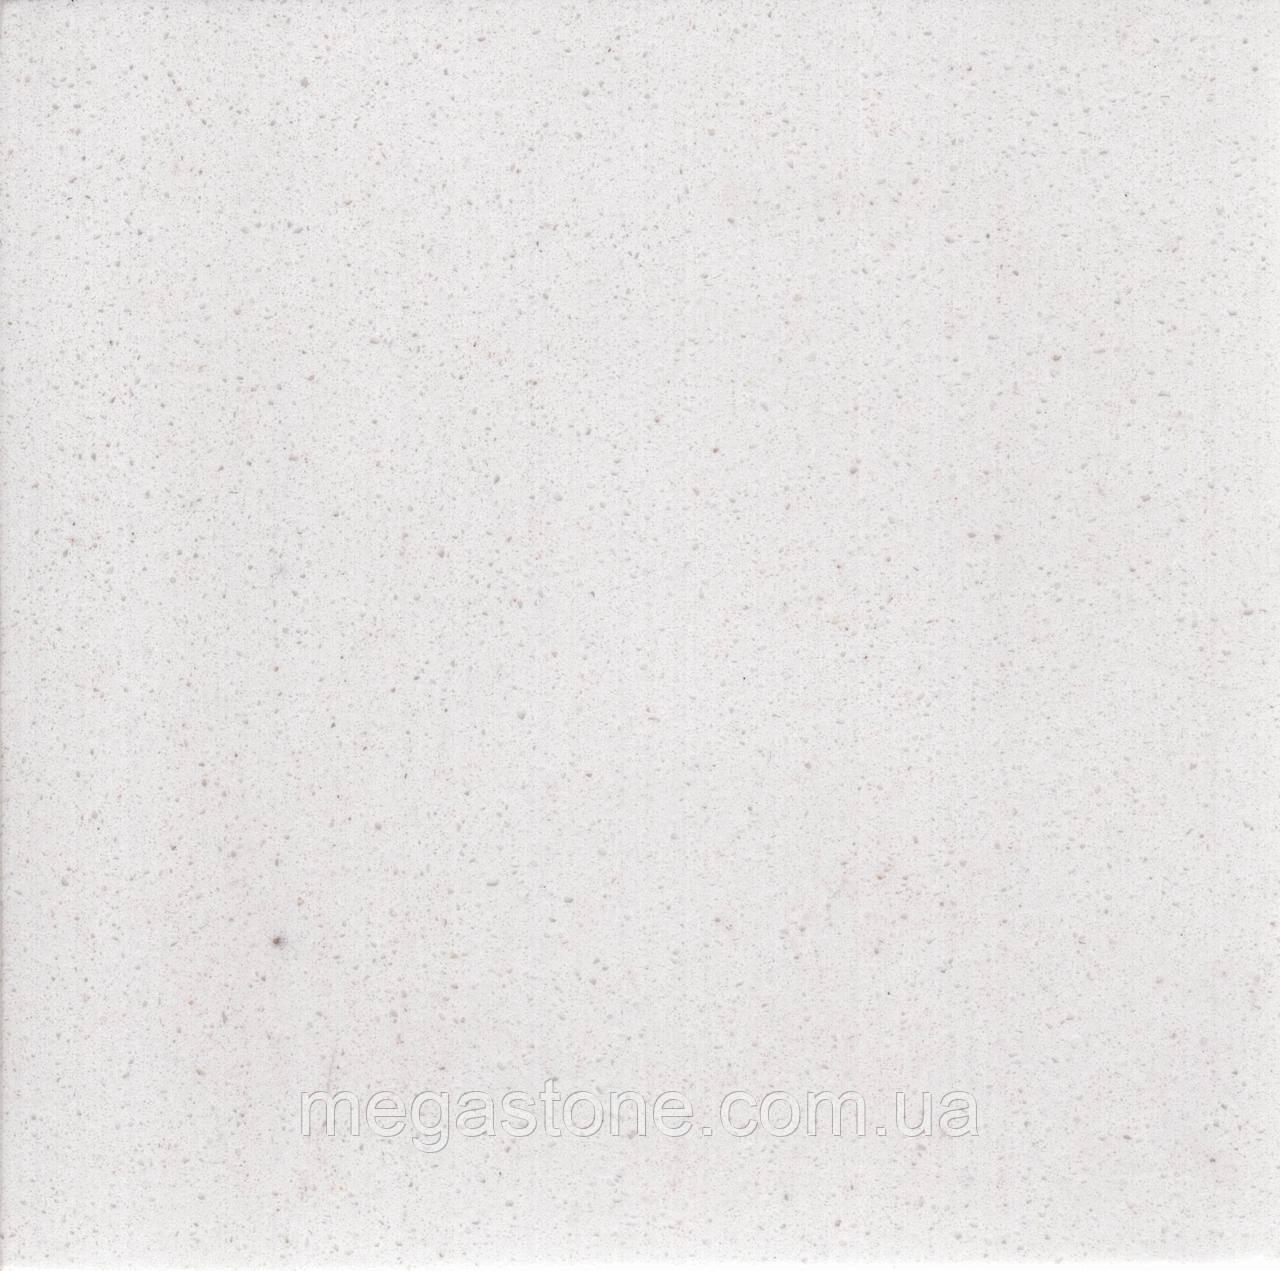 Штучний кварцовий камінь White 1116